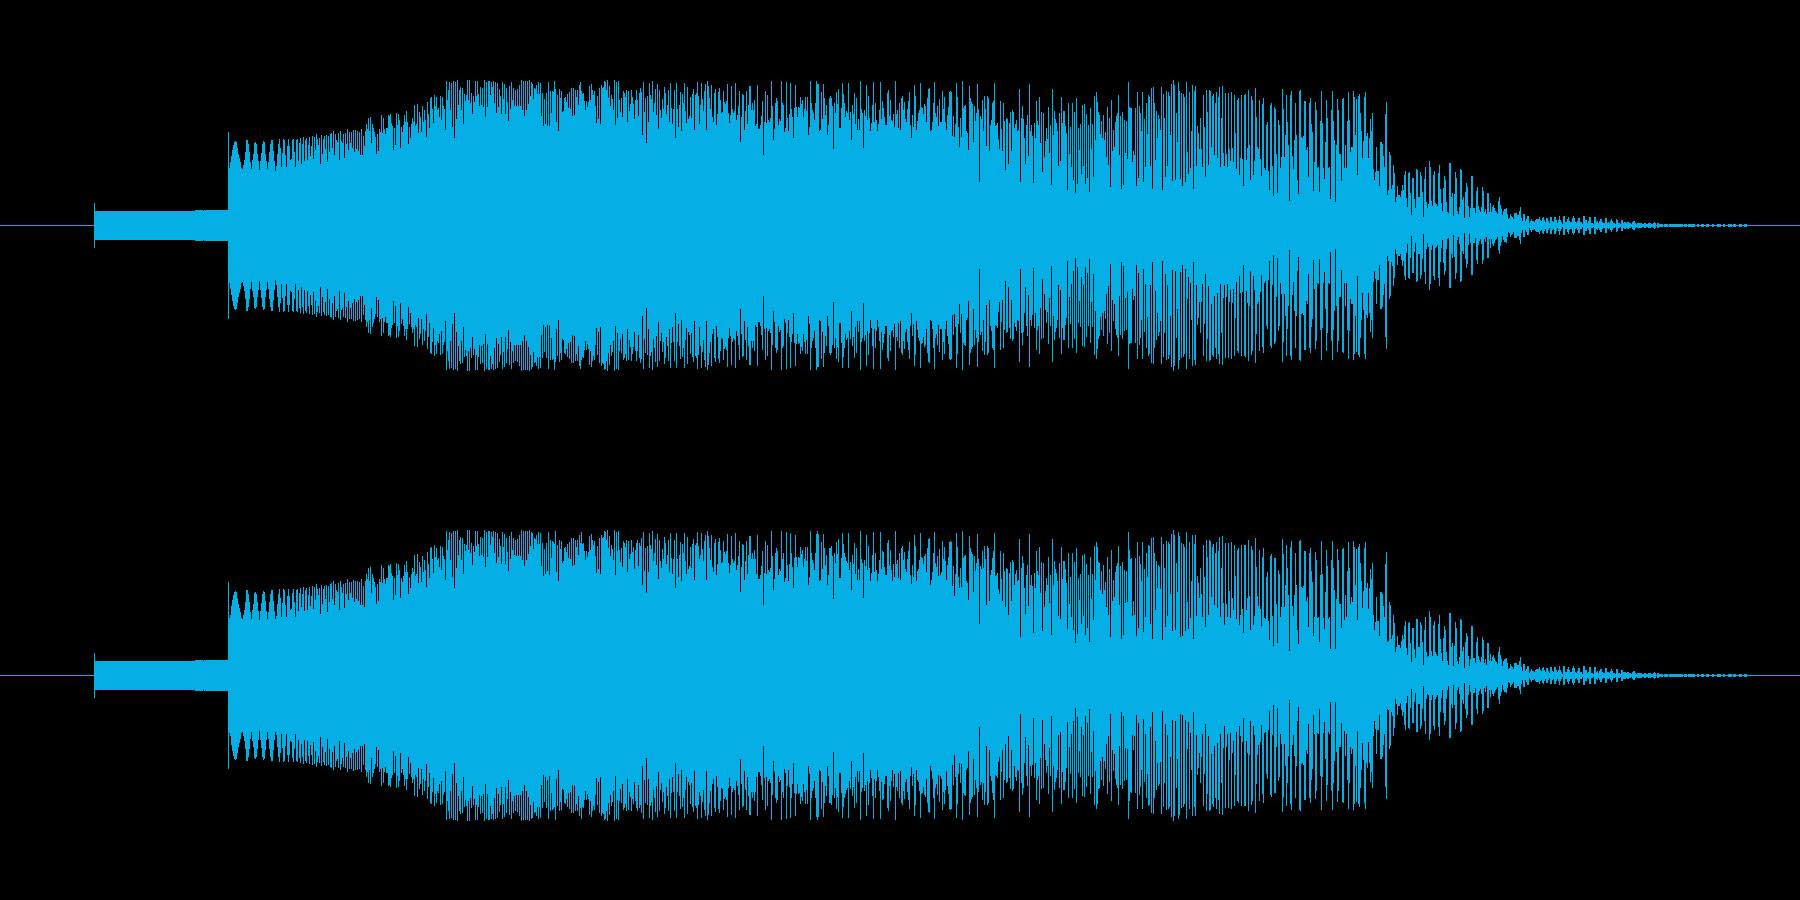 SFっぽい電子音。下降音などに。の再生済みの波形